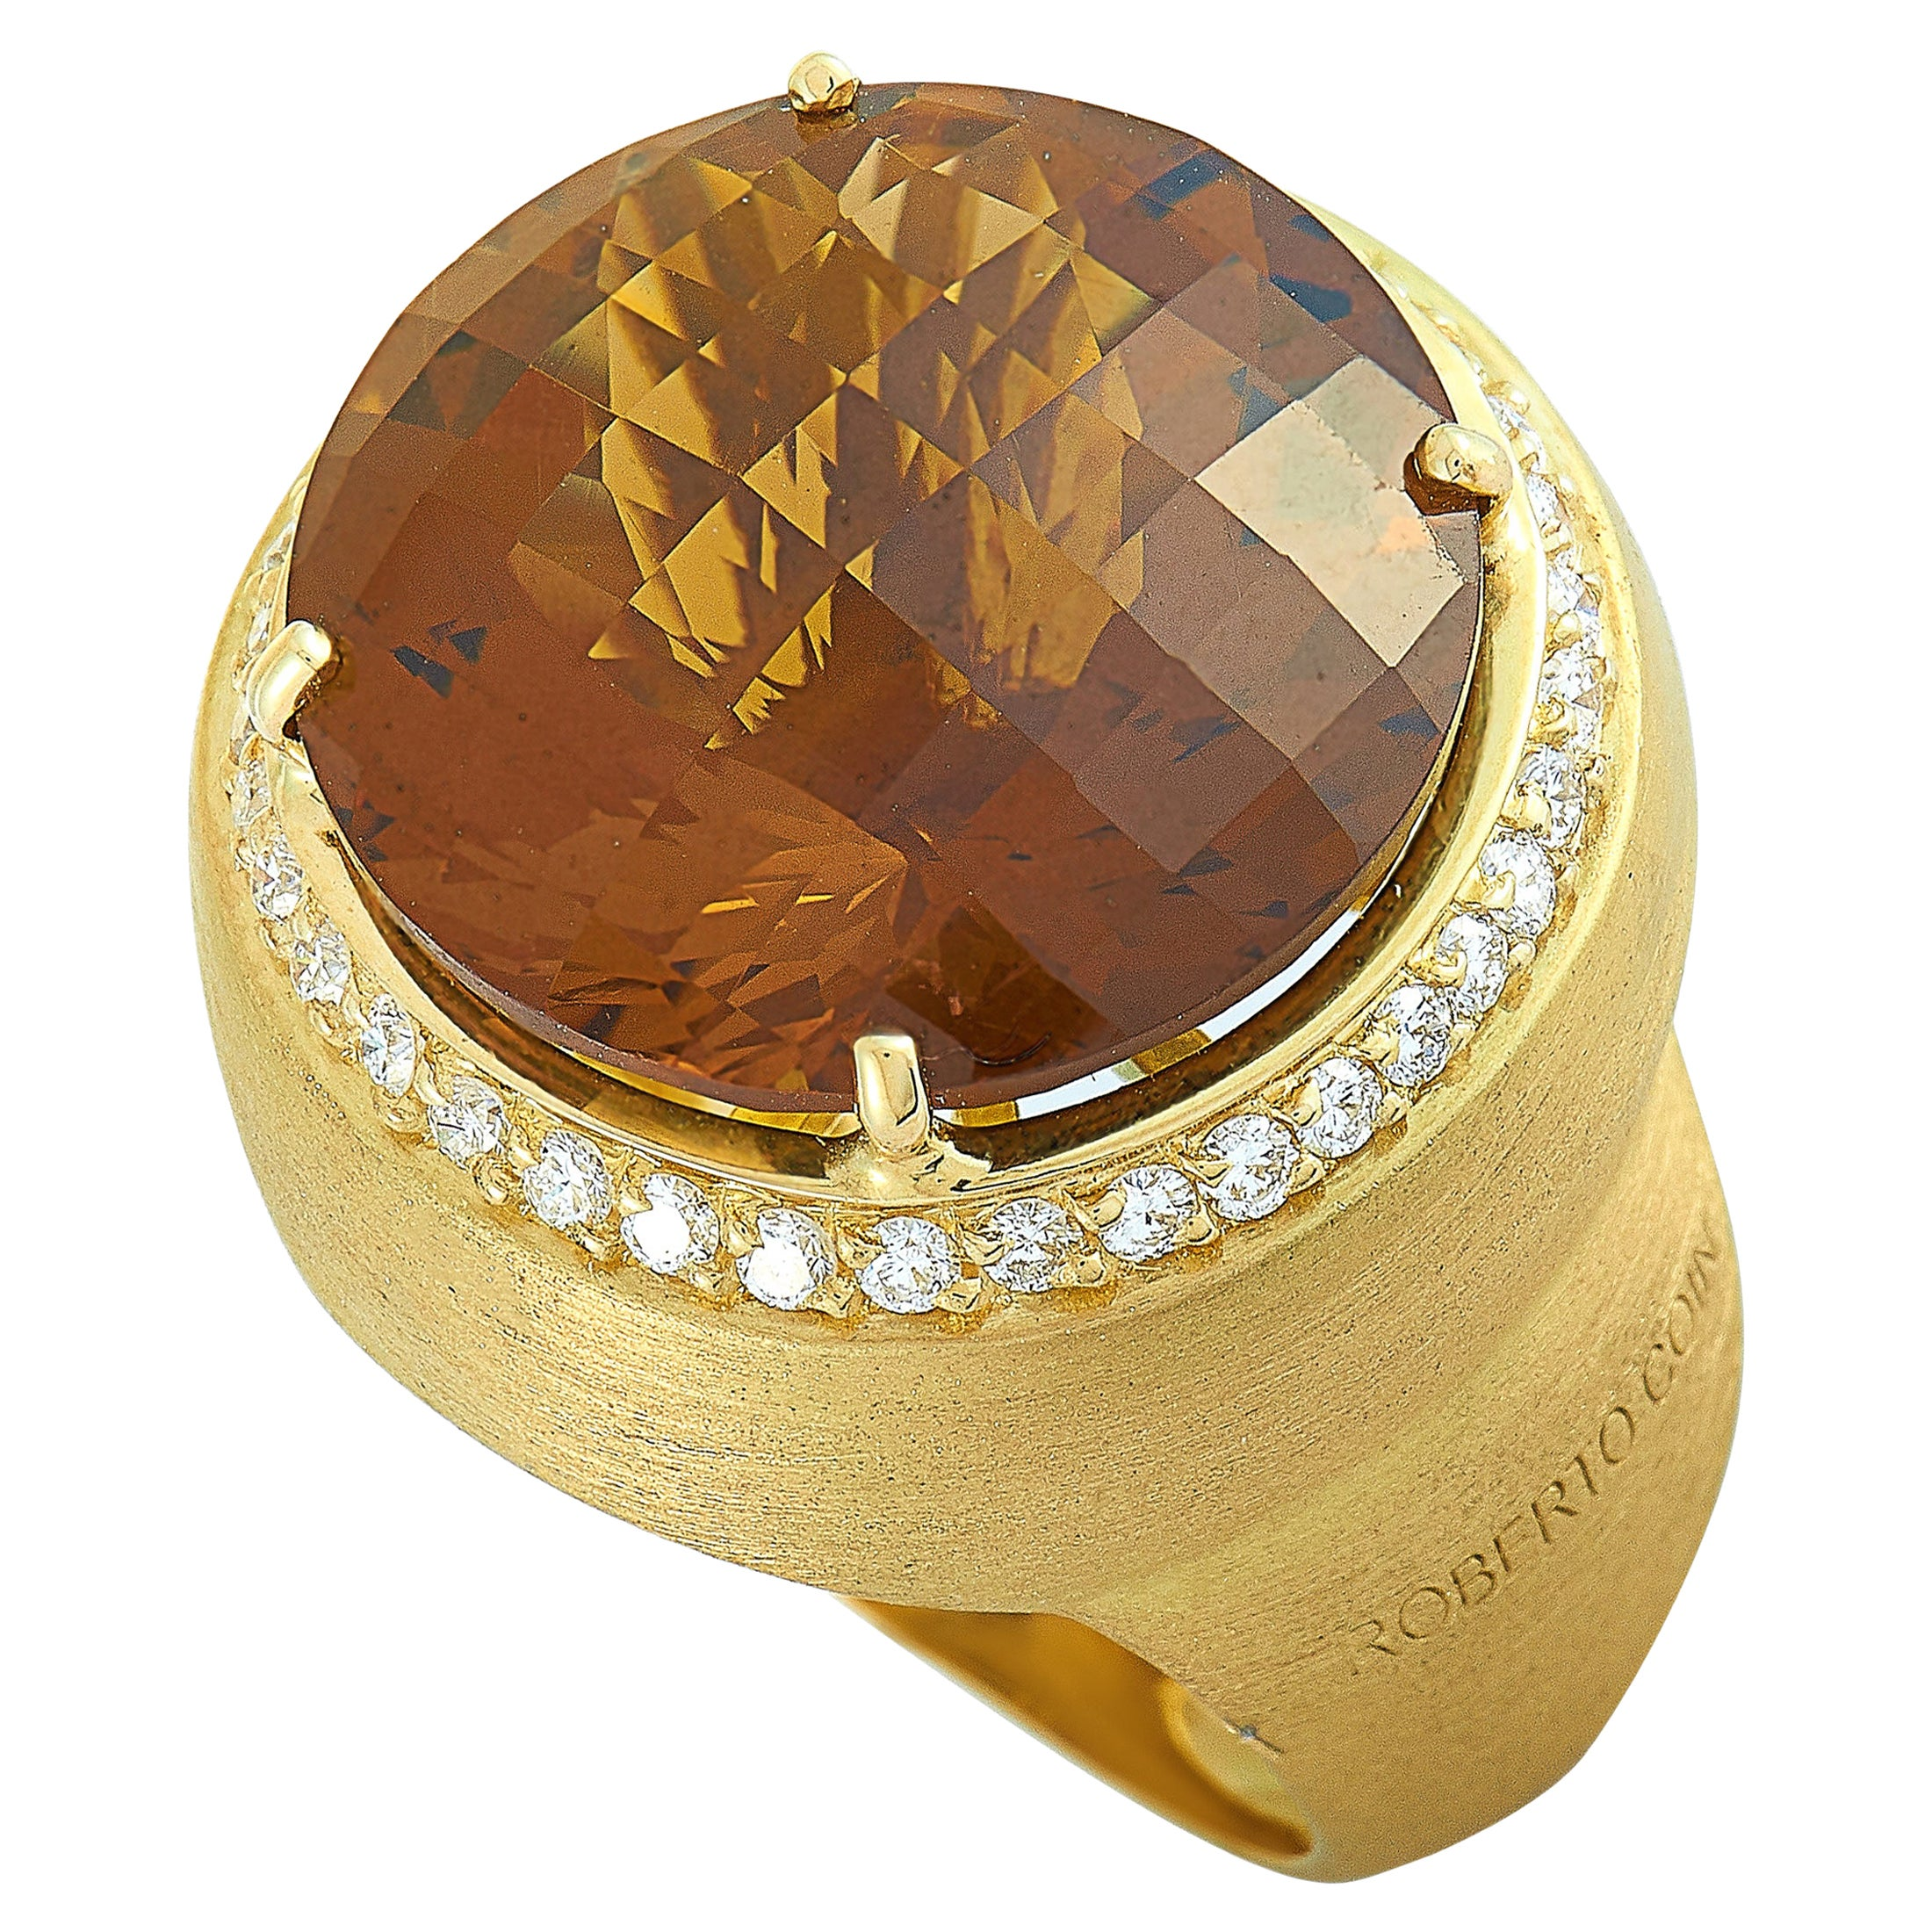 Roberto Coin 18 Karat Yellow Gold Diamond and Honey Quartz Round Ring